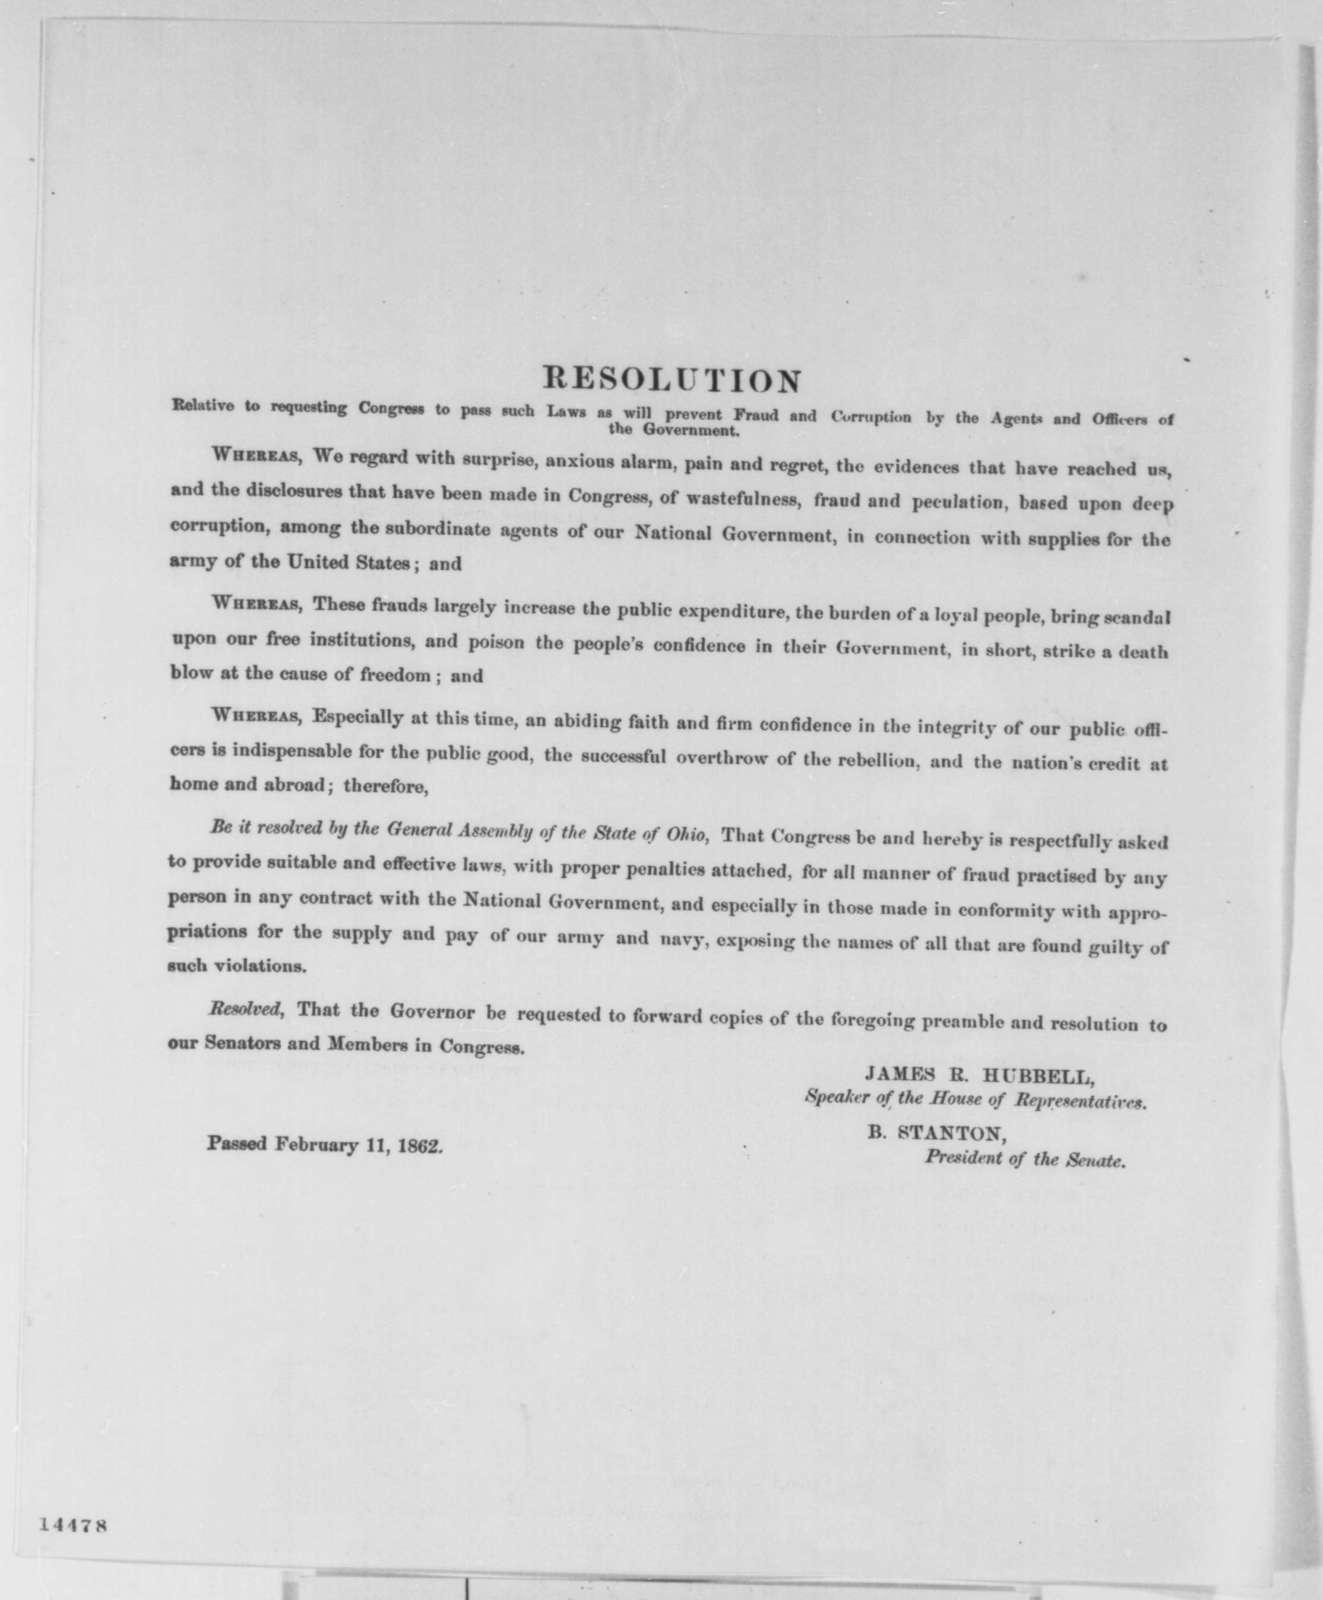 Ohio Legislature, Tuesday, February 11, 1862  (Printed Resolution)